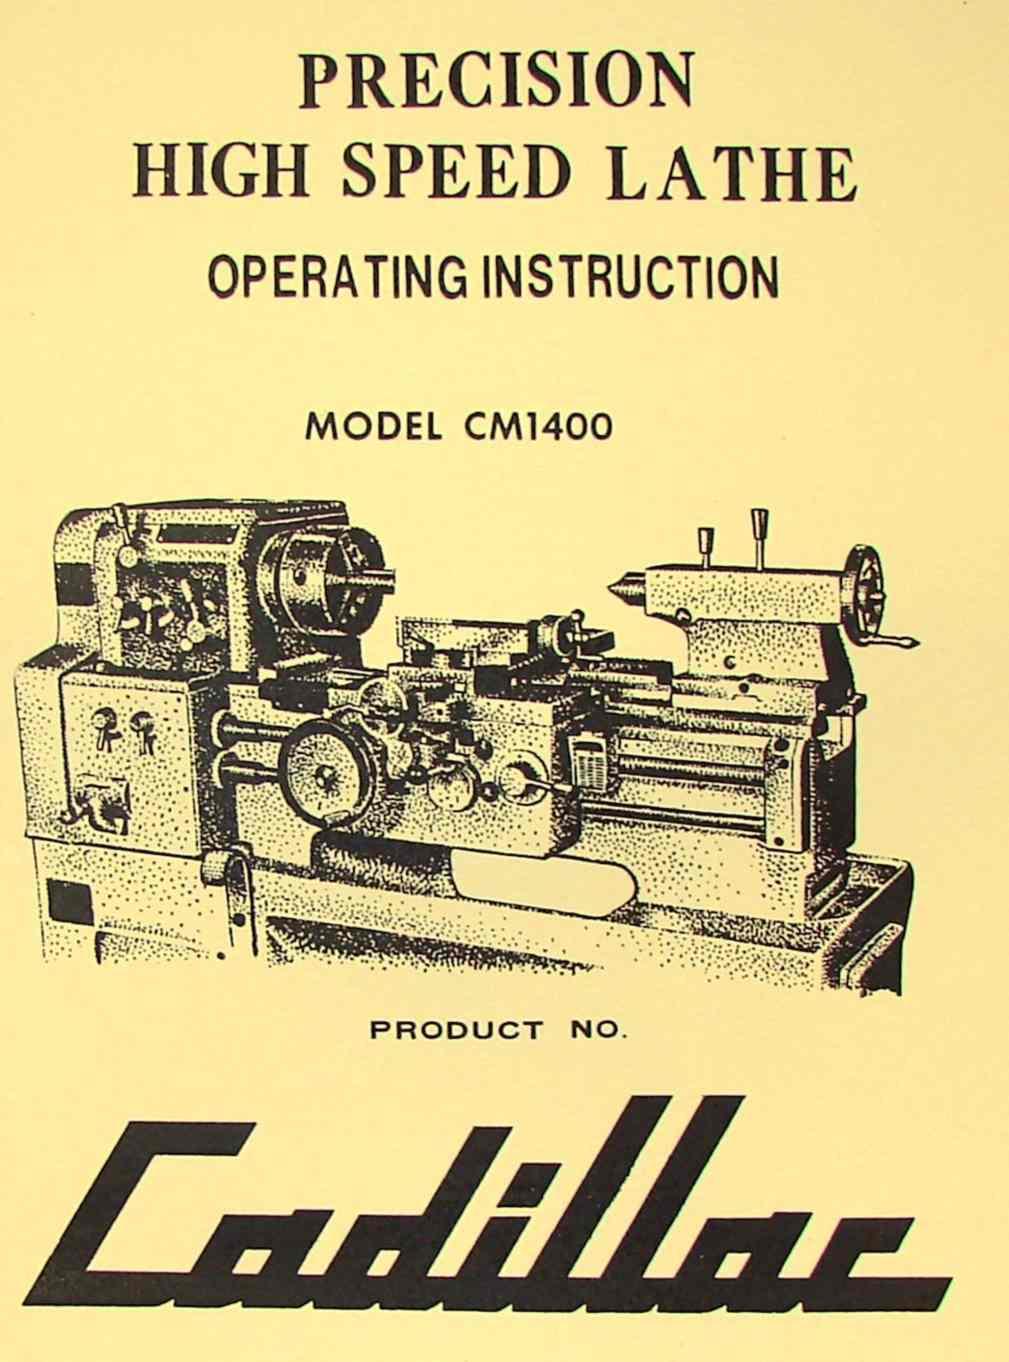 CADILLAC 14 inch Lathe CM1400 Instruction Manual | Ozark Tool Manuals &  Books